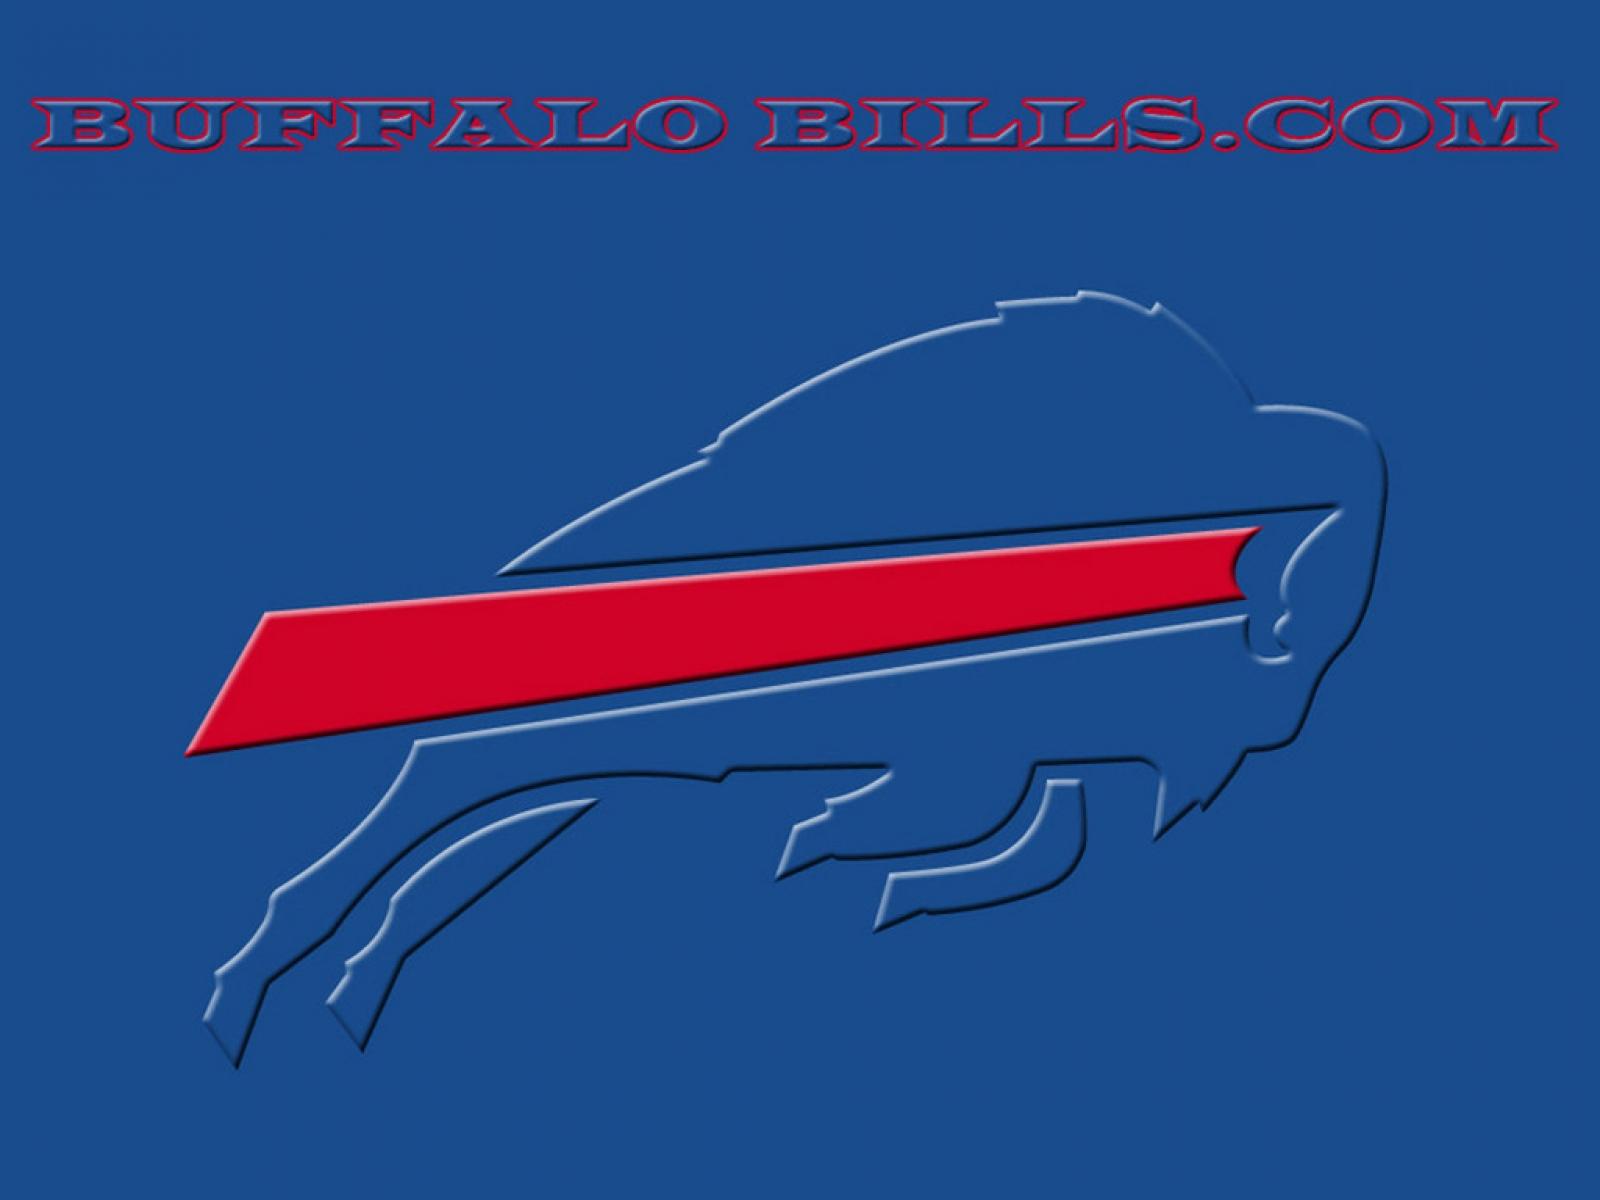 Buffalo Bills wallpaper HD images Buffalo Bills wallpapers 1600x1200